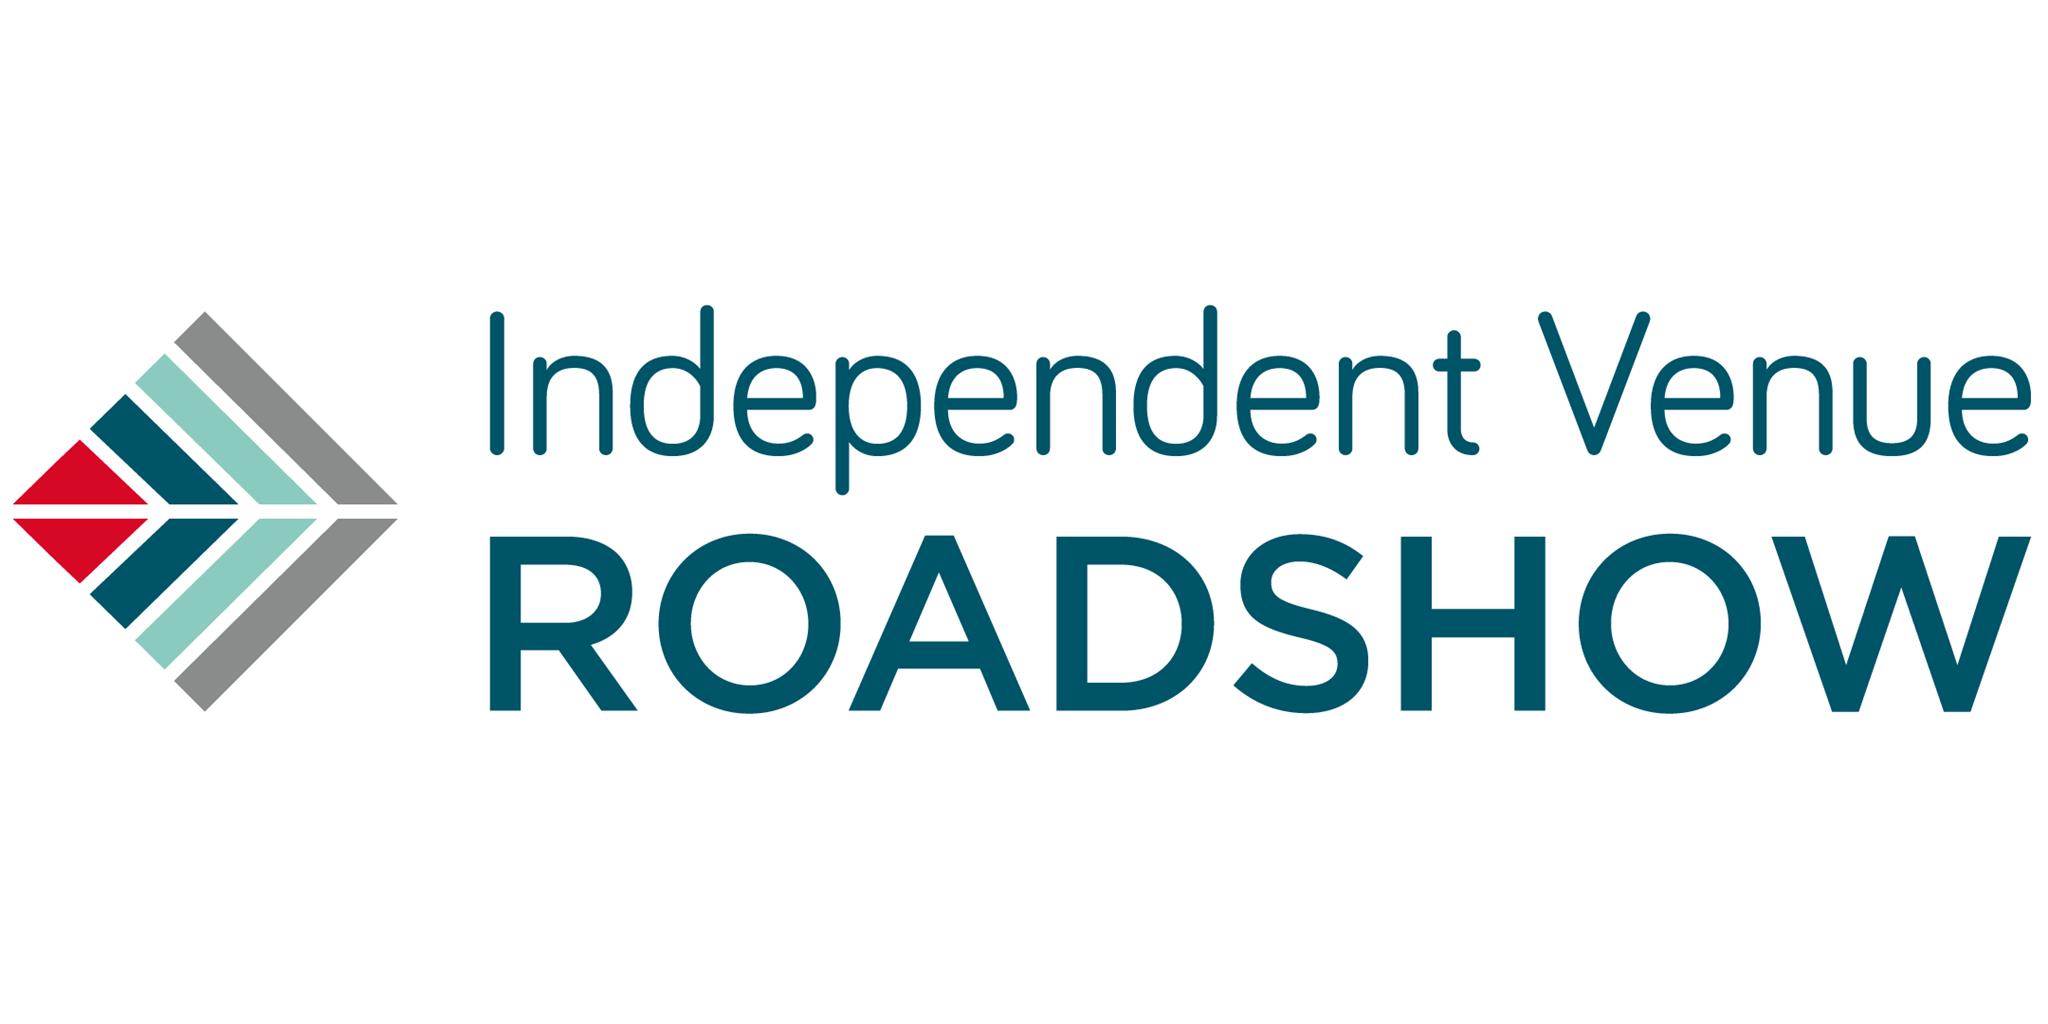 Independent Venue Roadshow November 2018 - Cr